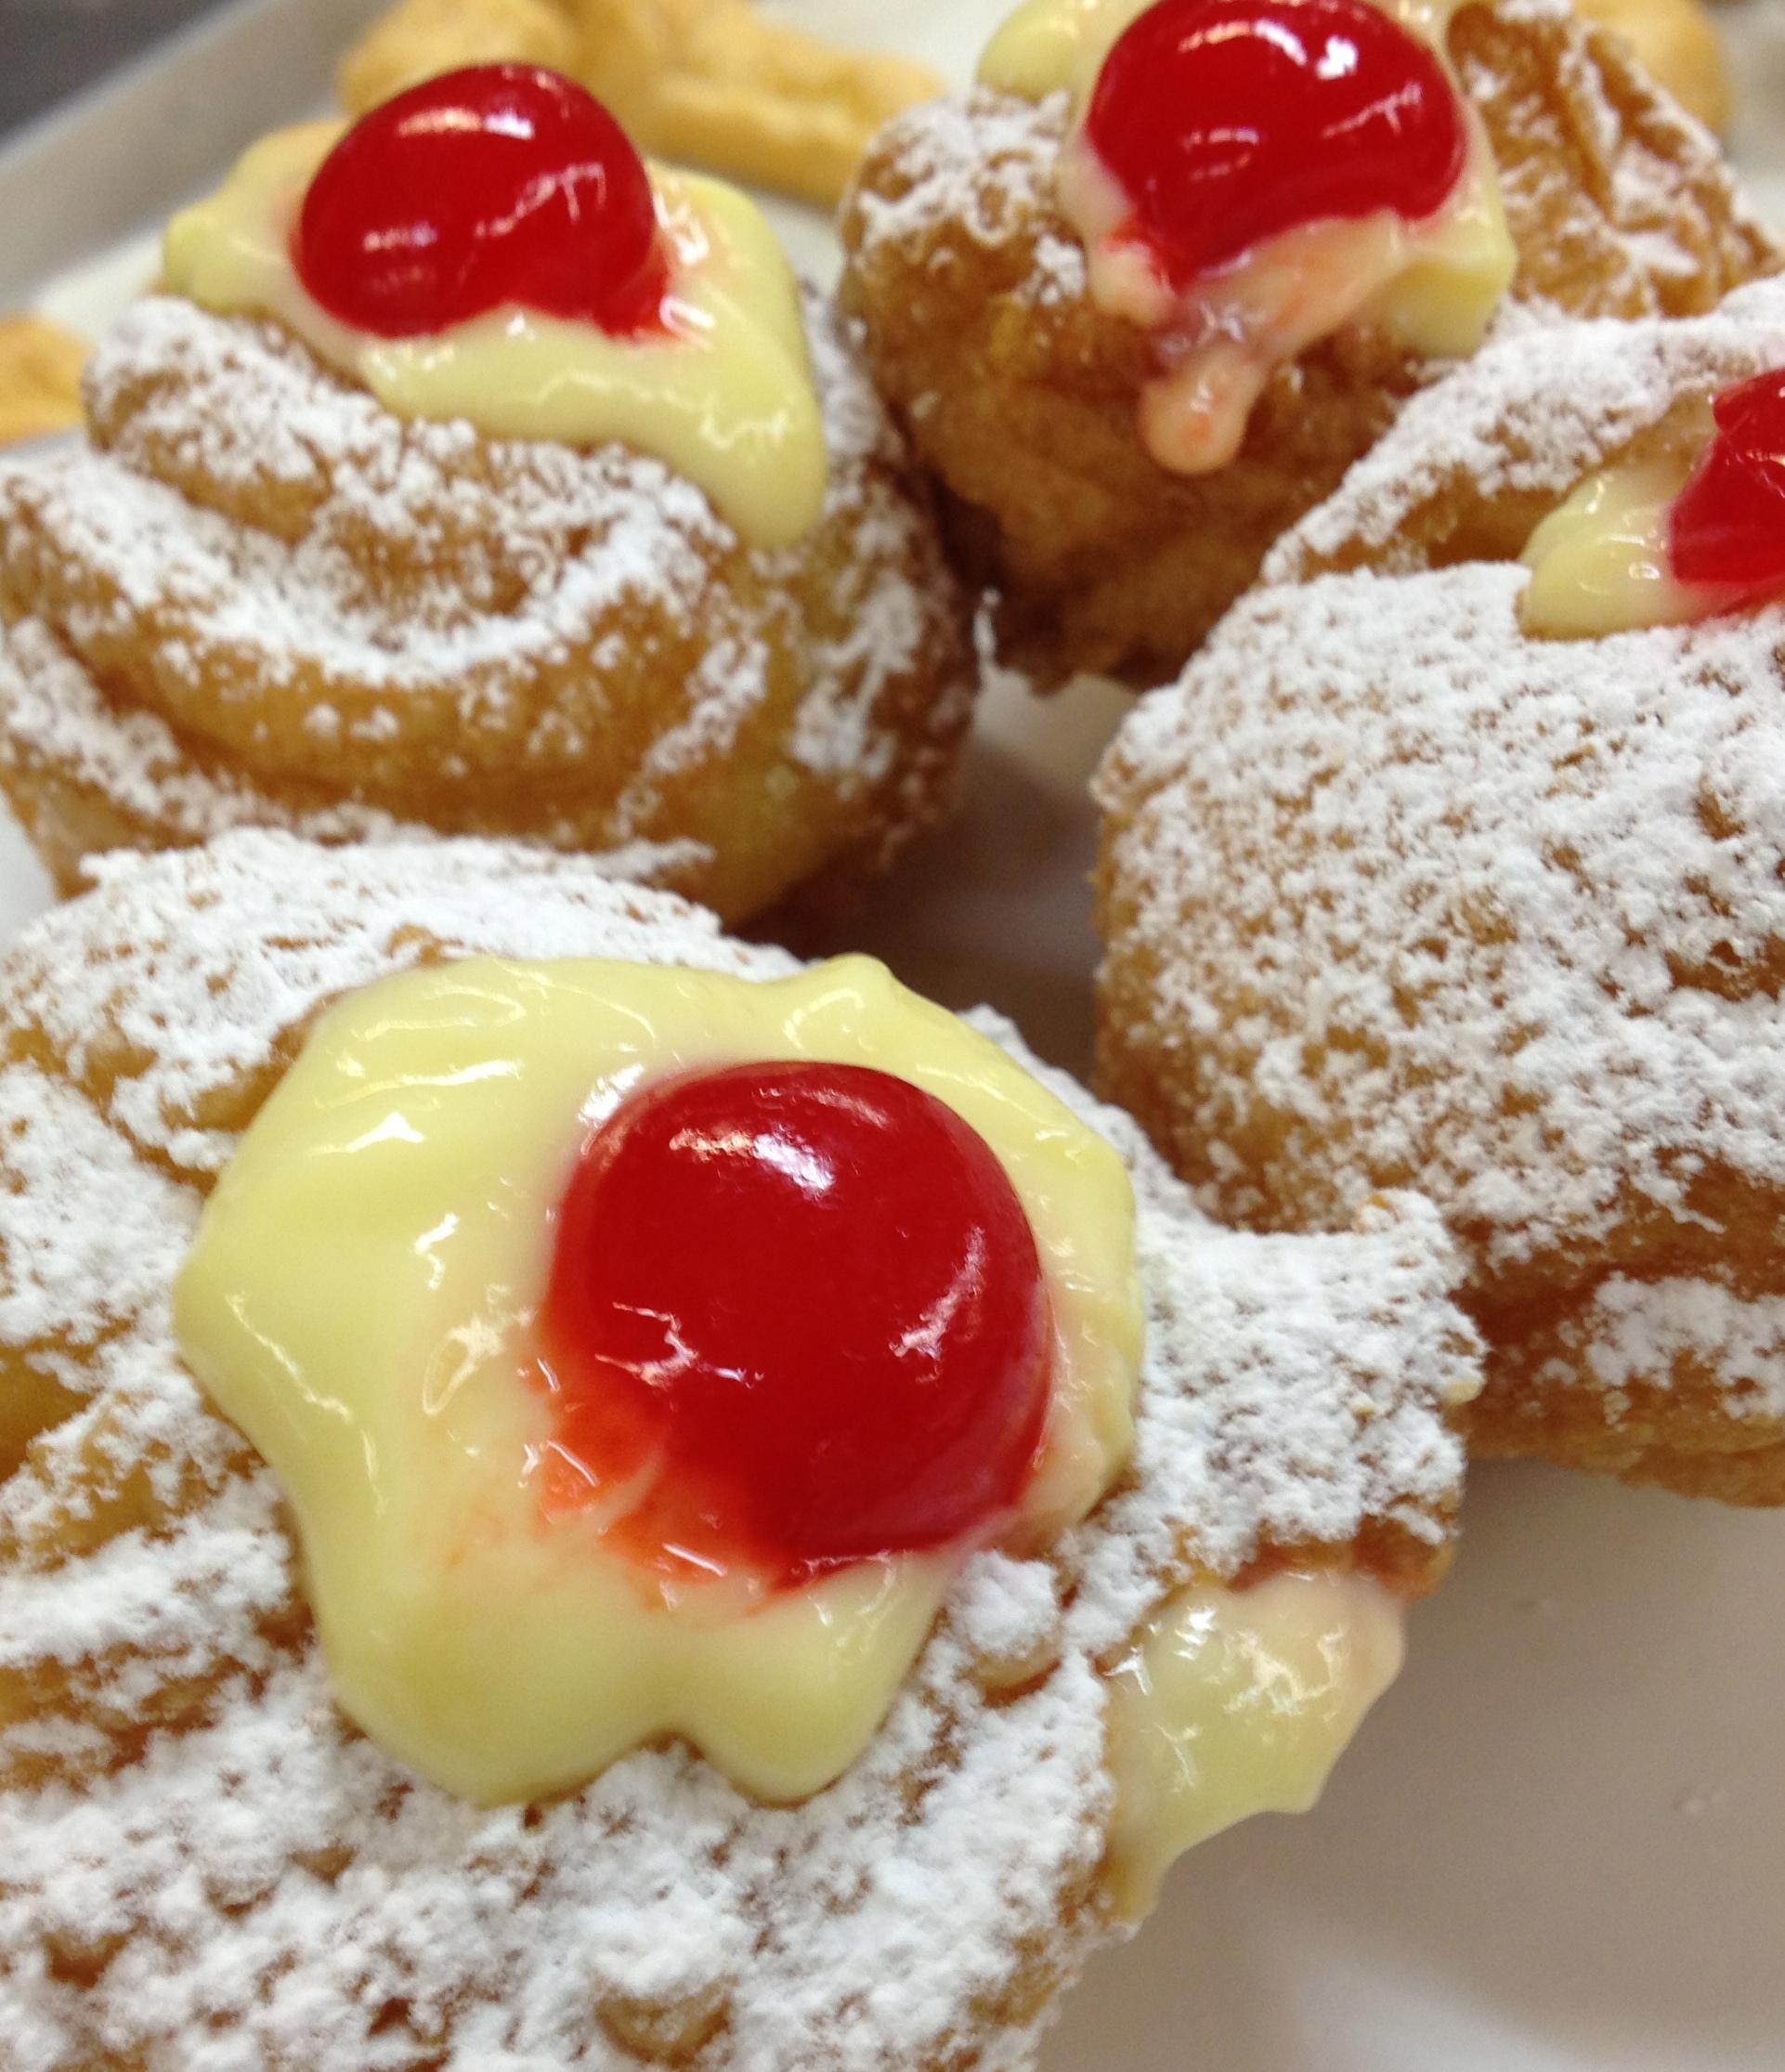 zeppolle with pastry cream